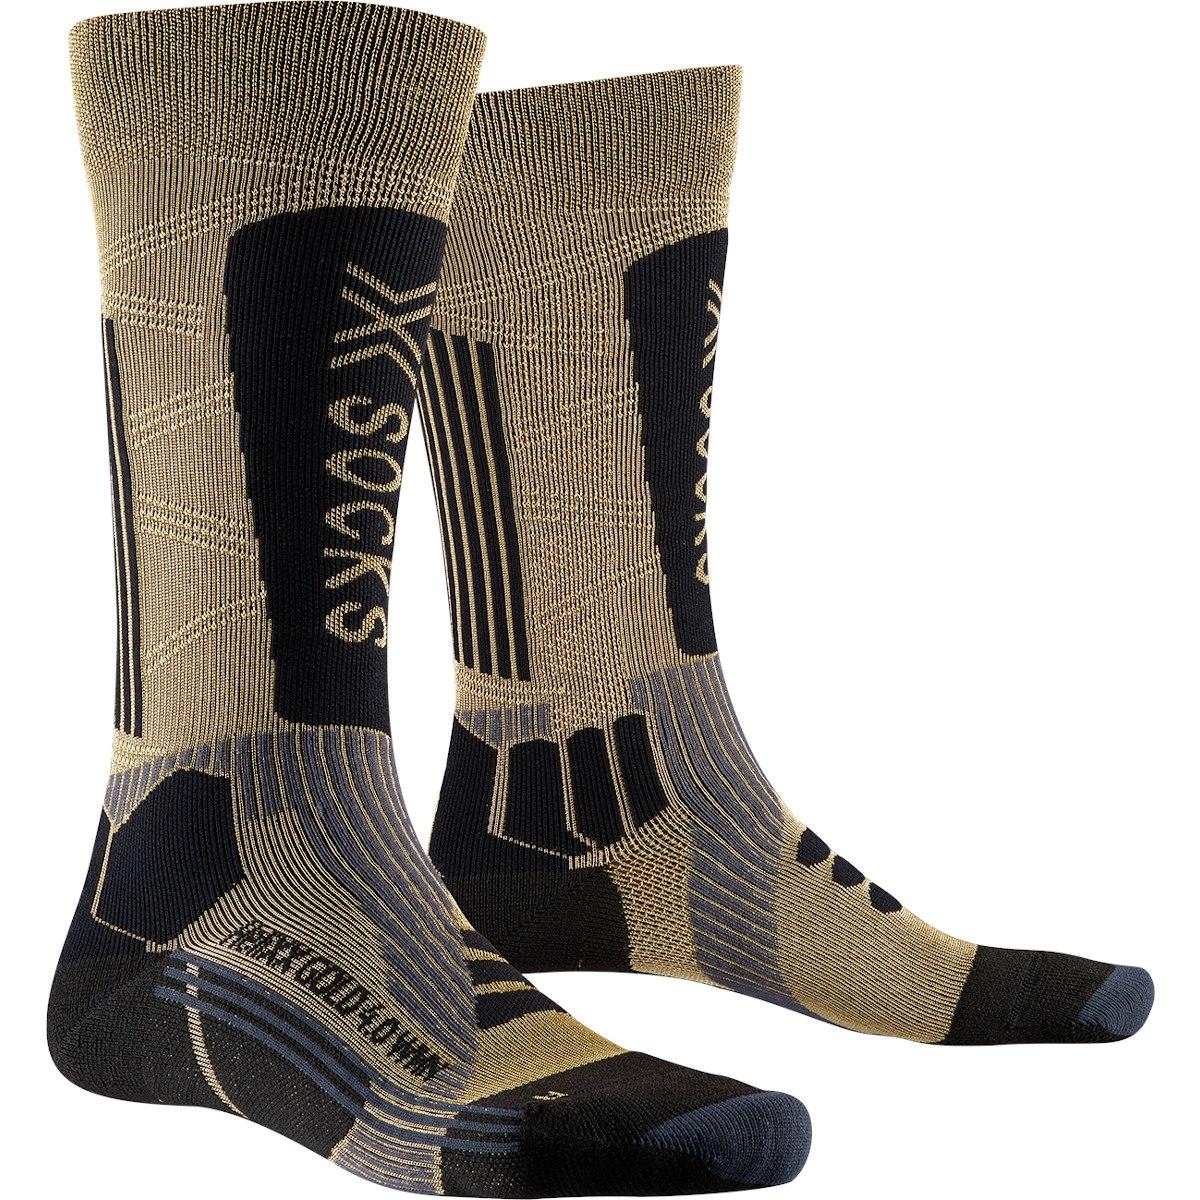 X-Socks HeliXX Gold 4.0 Socken für Damen - gold/black